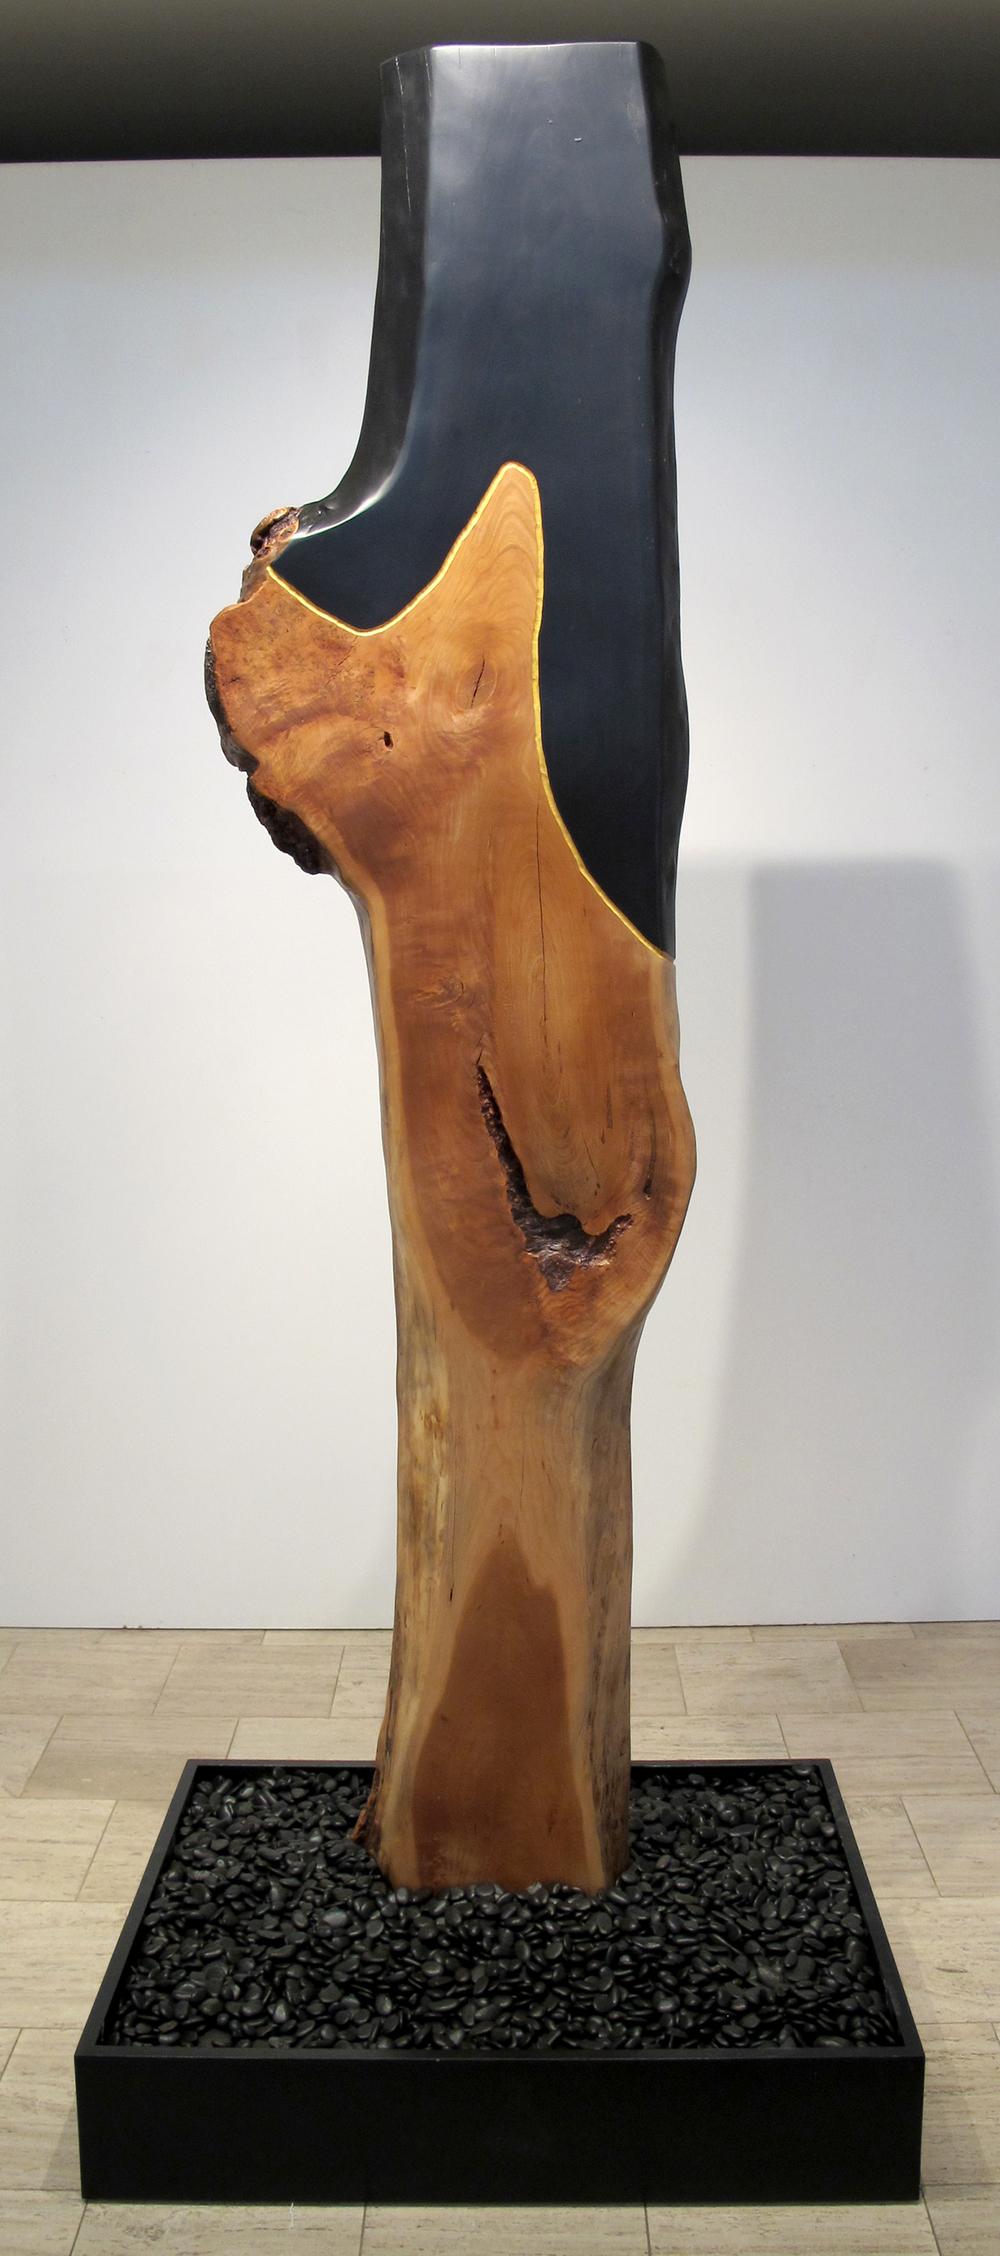 "Lands Language  Jeffrey Brosk JB151 Cherry Wood, Black Stain, Gold Leaf 90"" x 12"" x 3"""